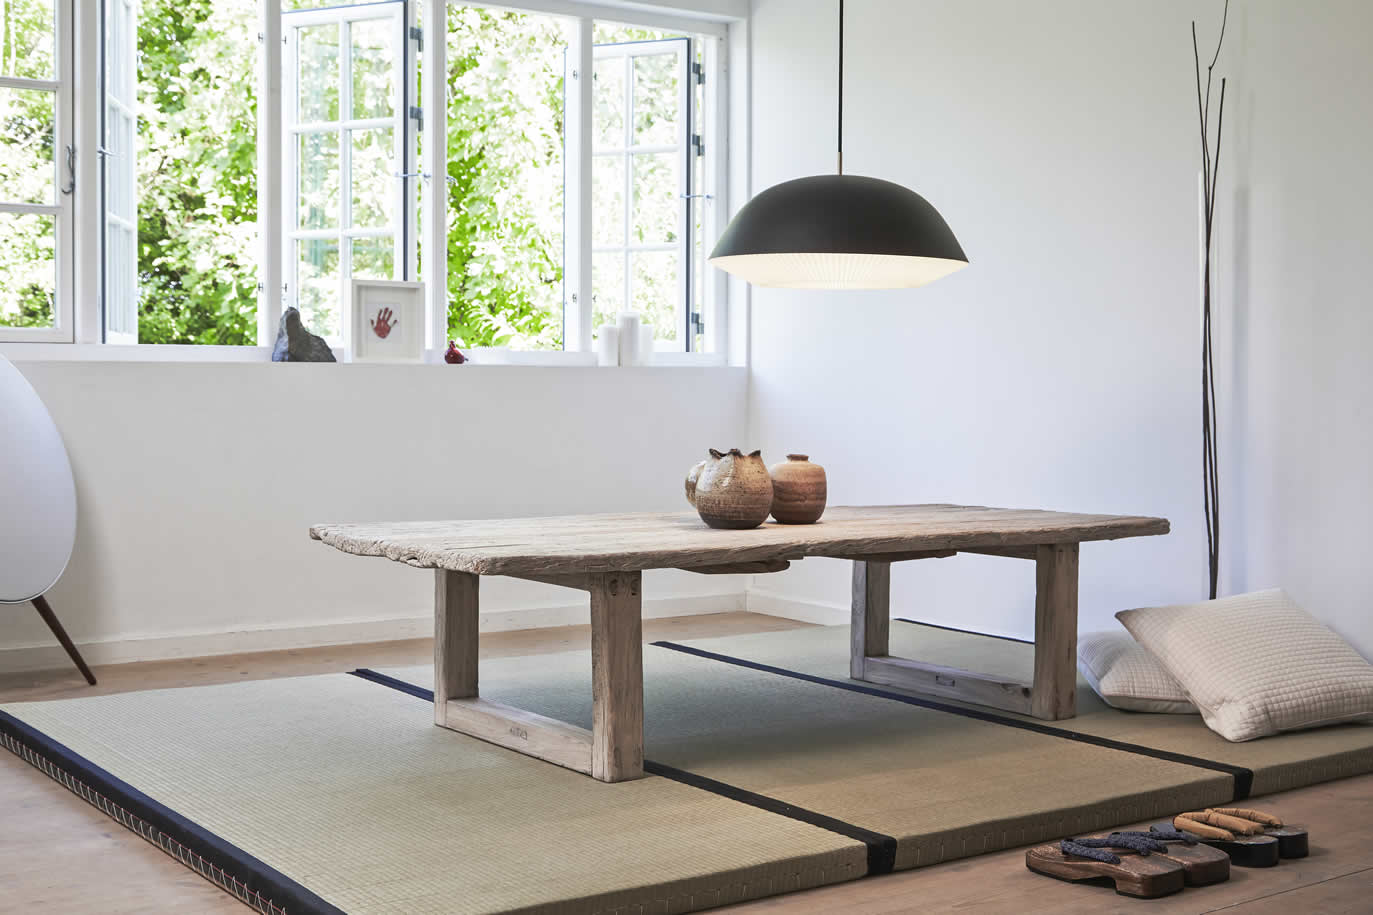 Moderne Keuken Lampen : Klassieke moderne hang keukenlampen